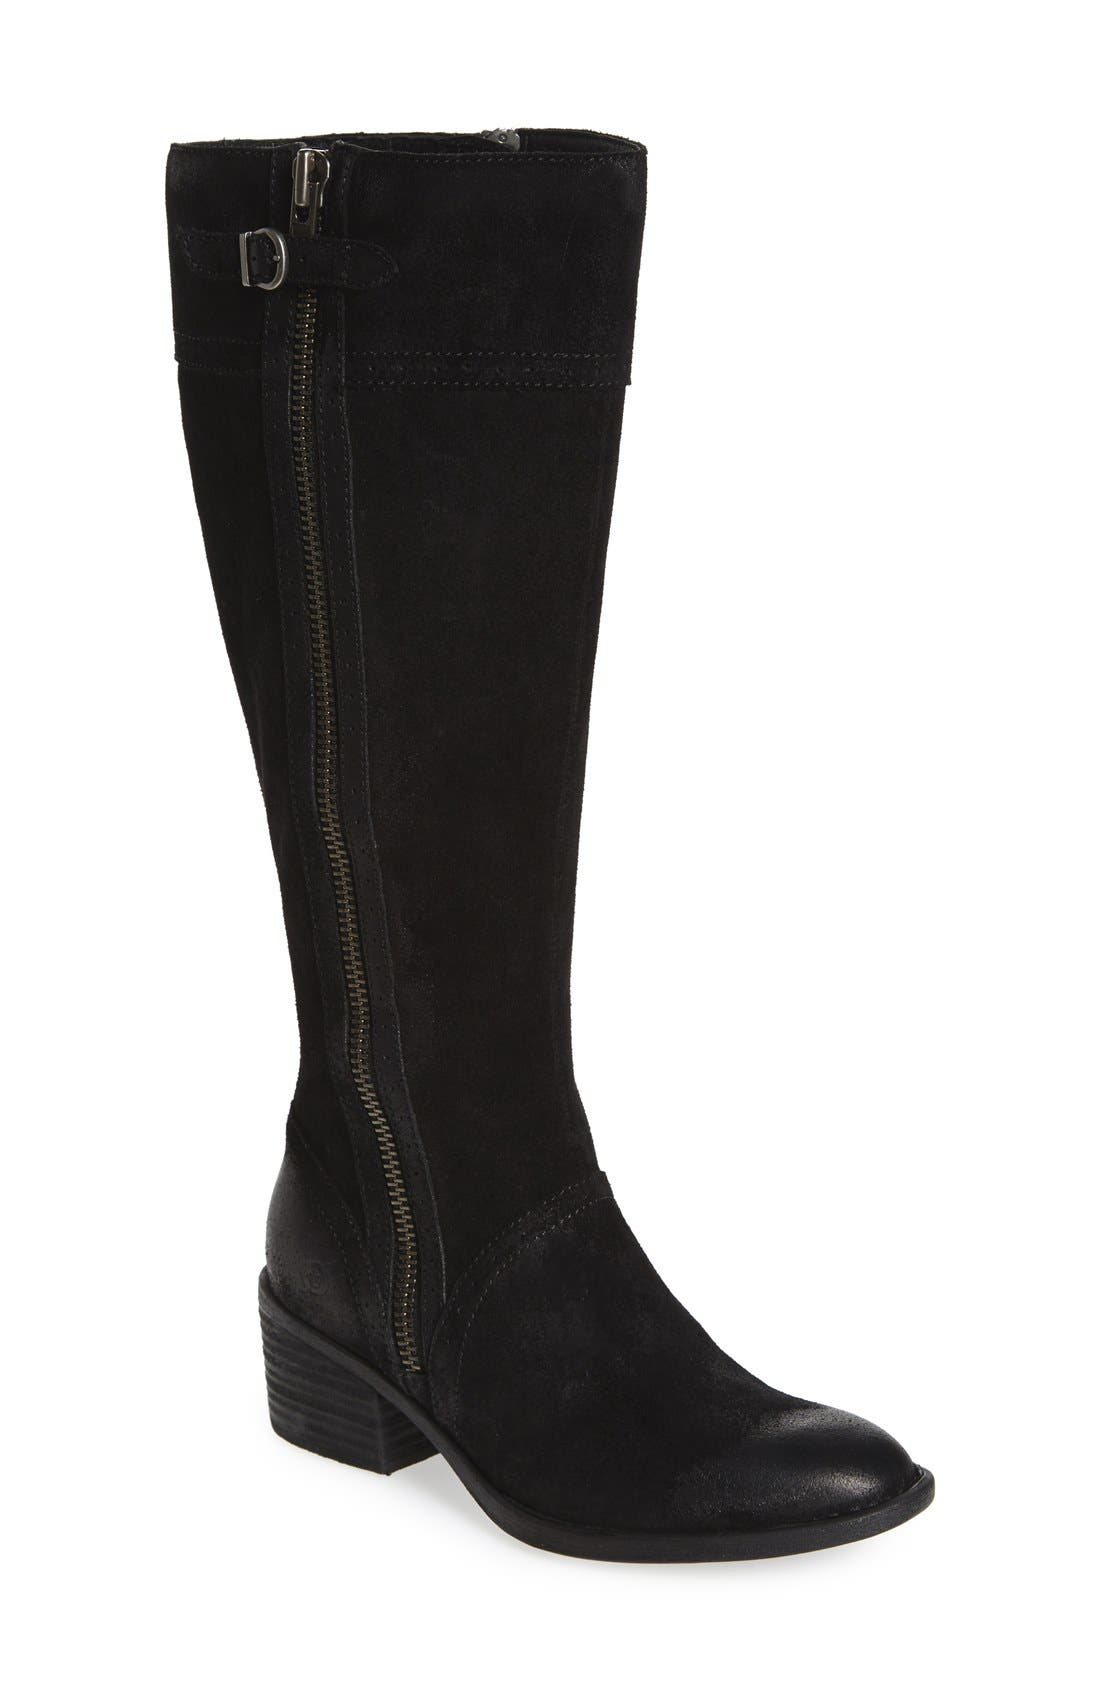 Boots for Women, Booties On Sale, Black, Velvet, 2017, 2.5 3.5 Isabel Marant